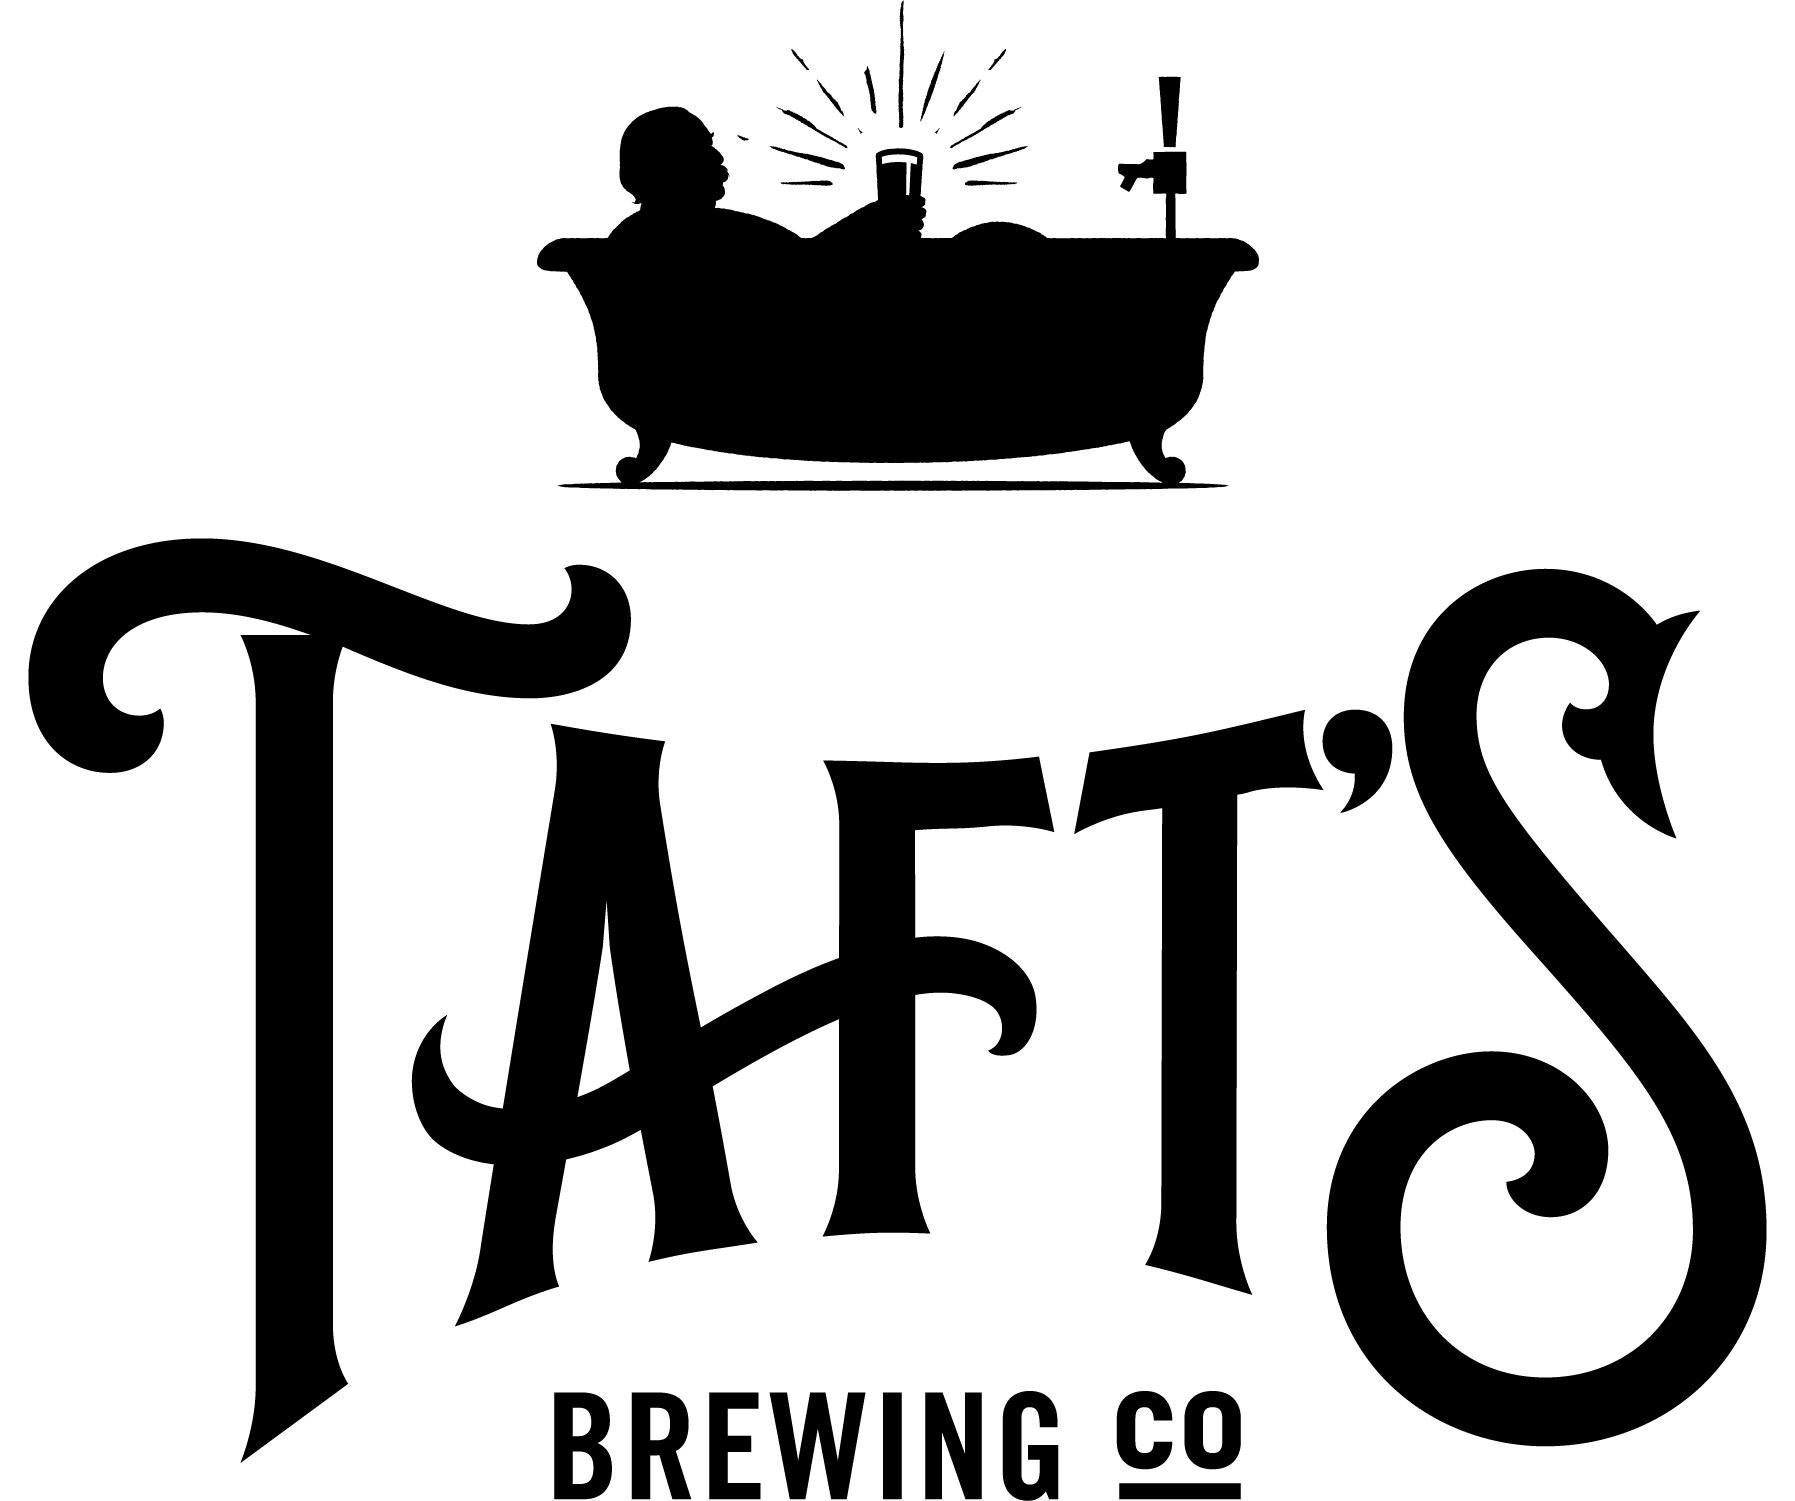 Tafts-01.jpg